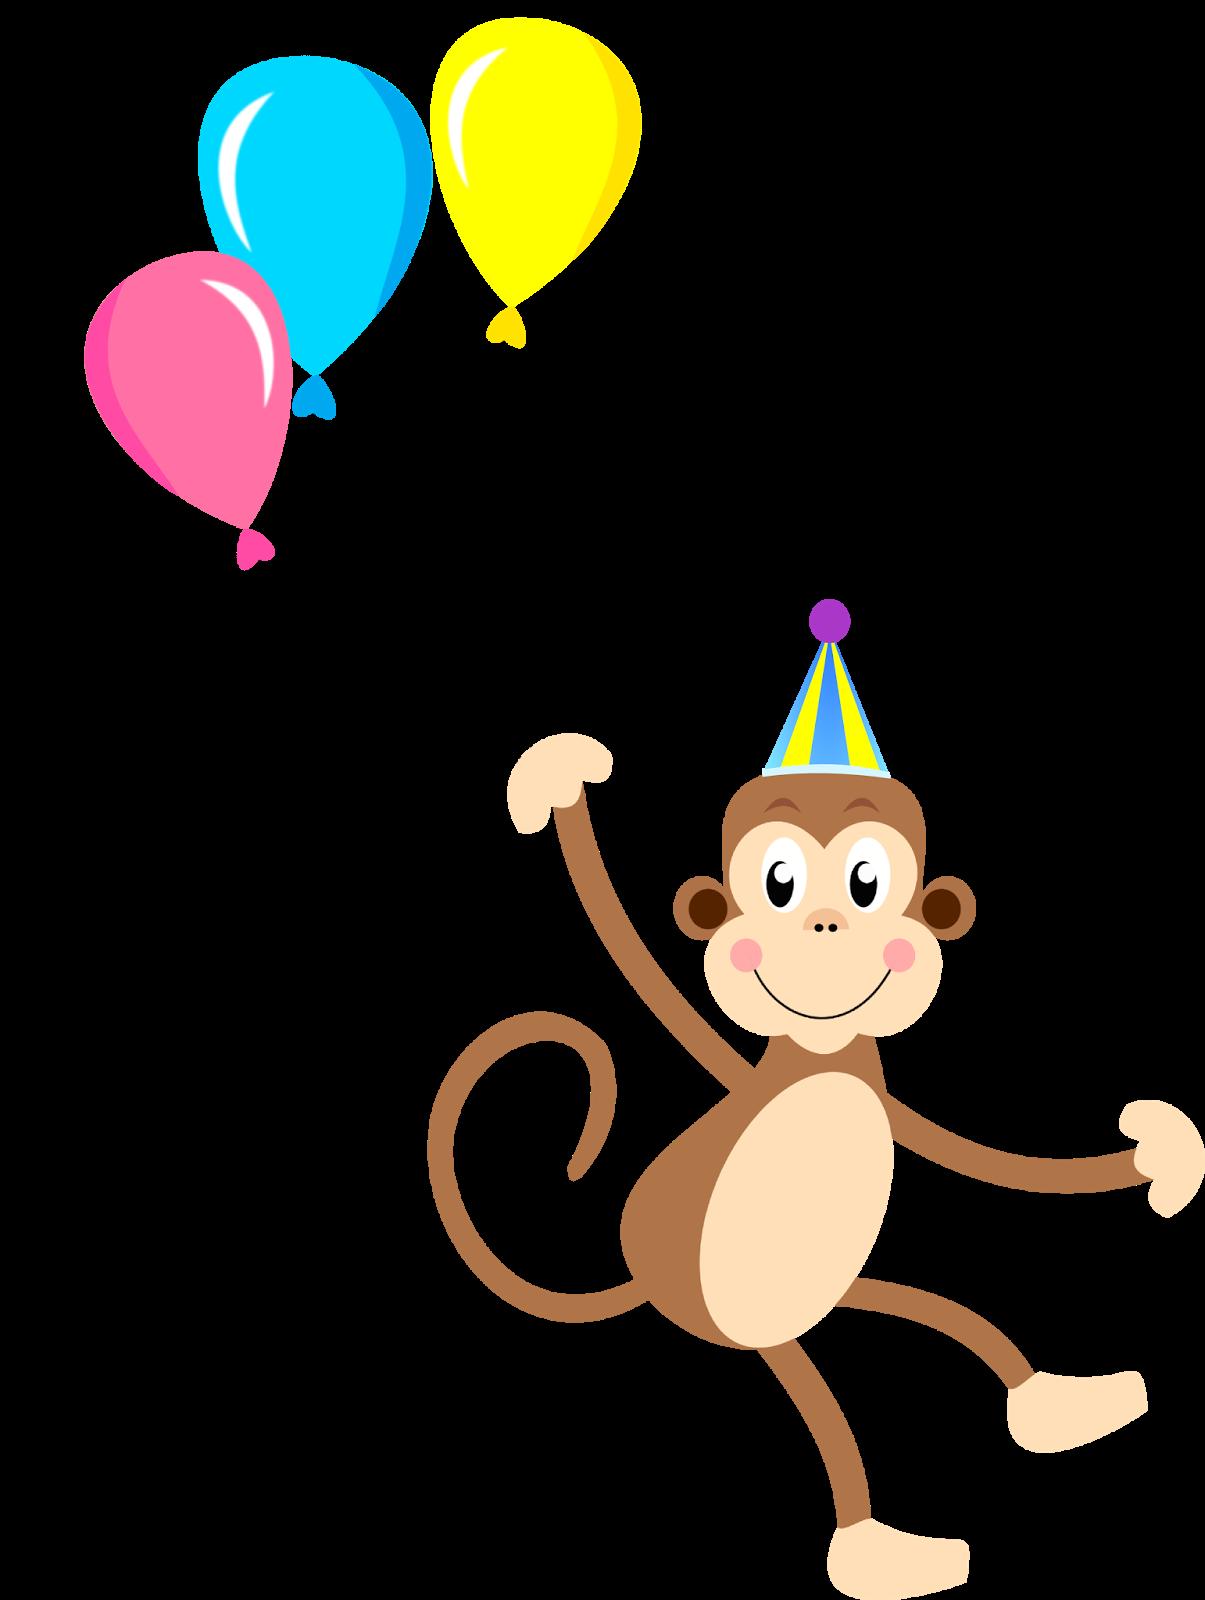 Cliparts geburtstag einladung vector download Macaco circo Montando a minha festa | sirk carnal | Pinterest vector download